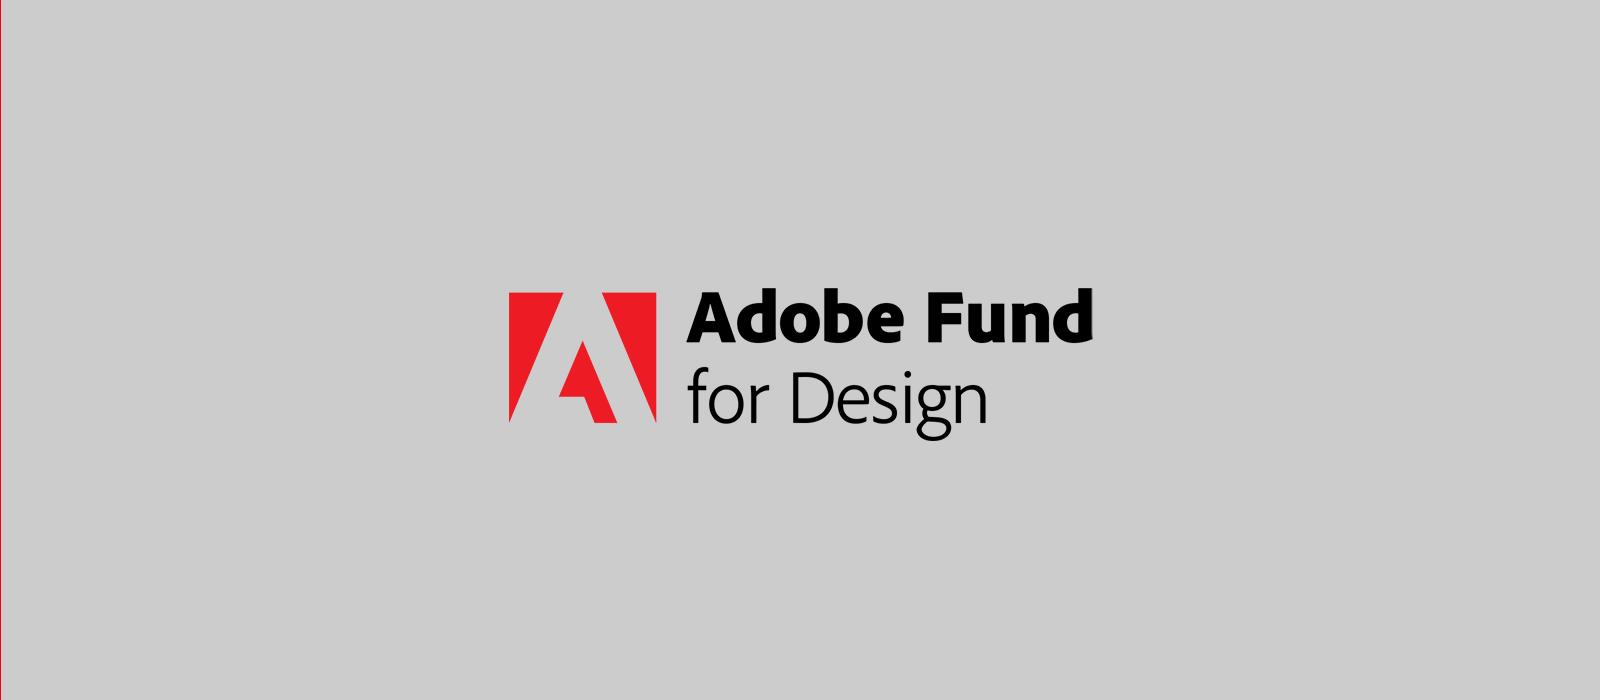 Fundo Adobe para Design